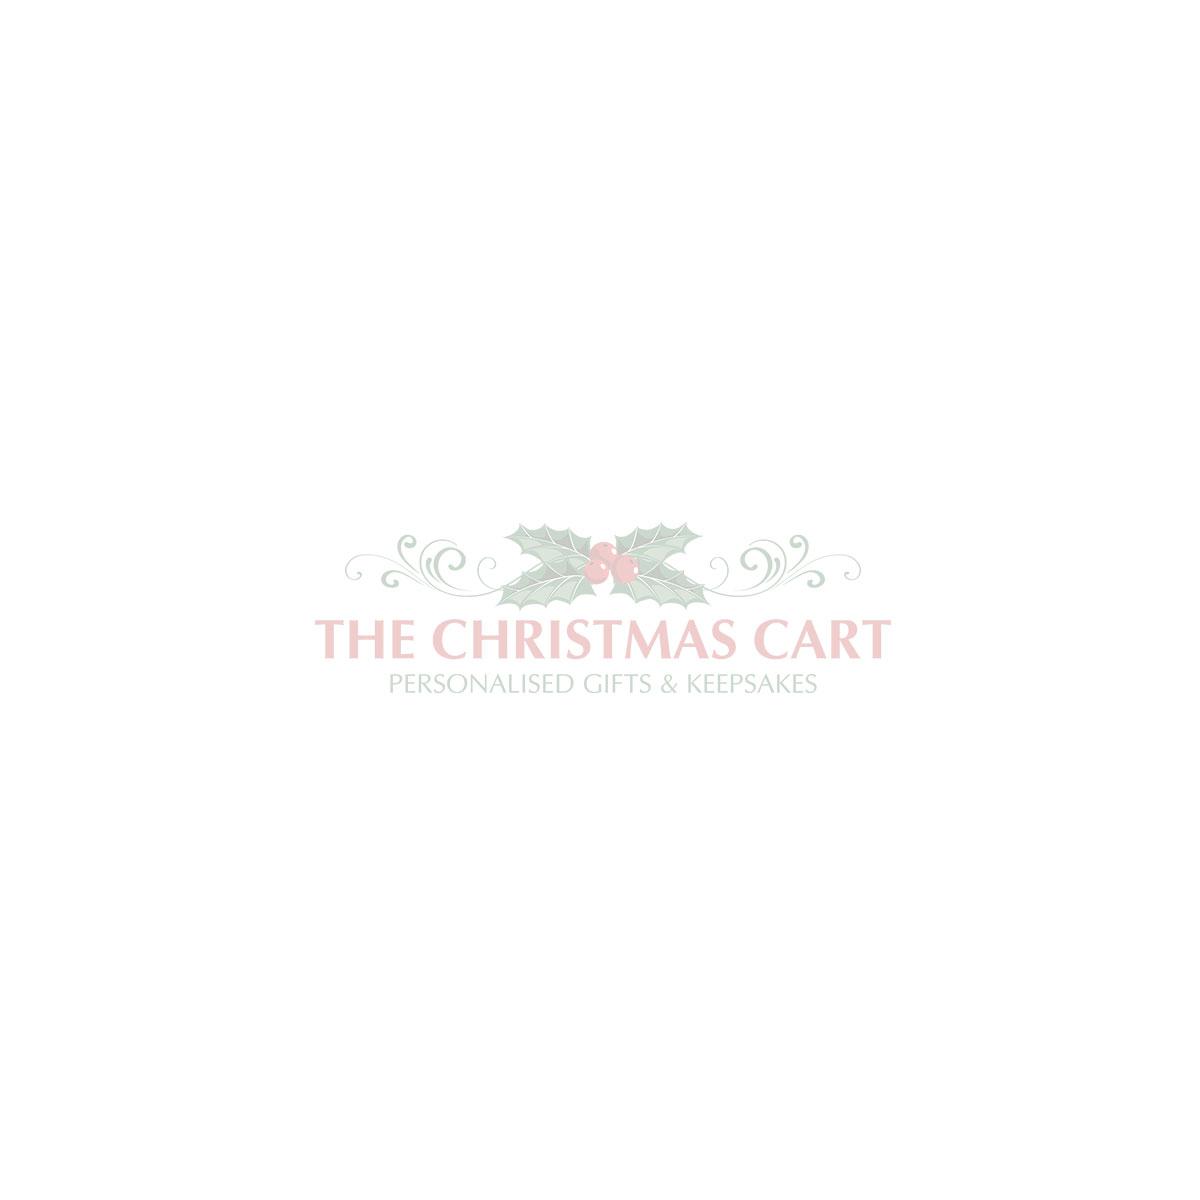 Native Eucalyptus Leaf Christmas Wreath with White Berries